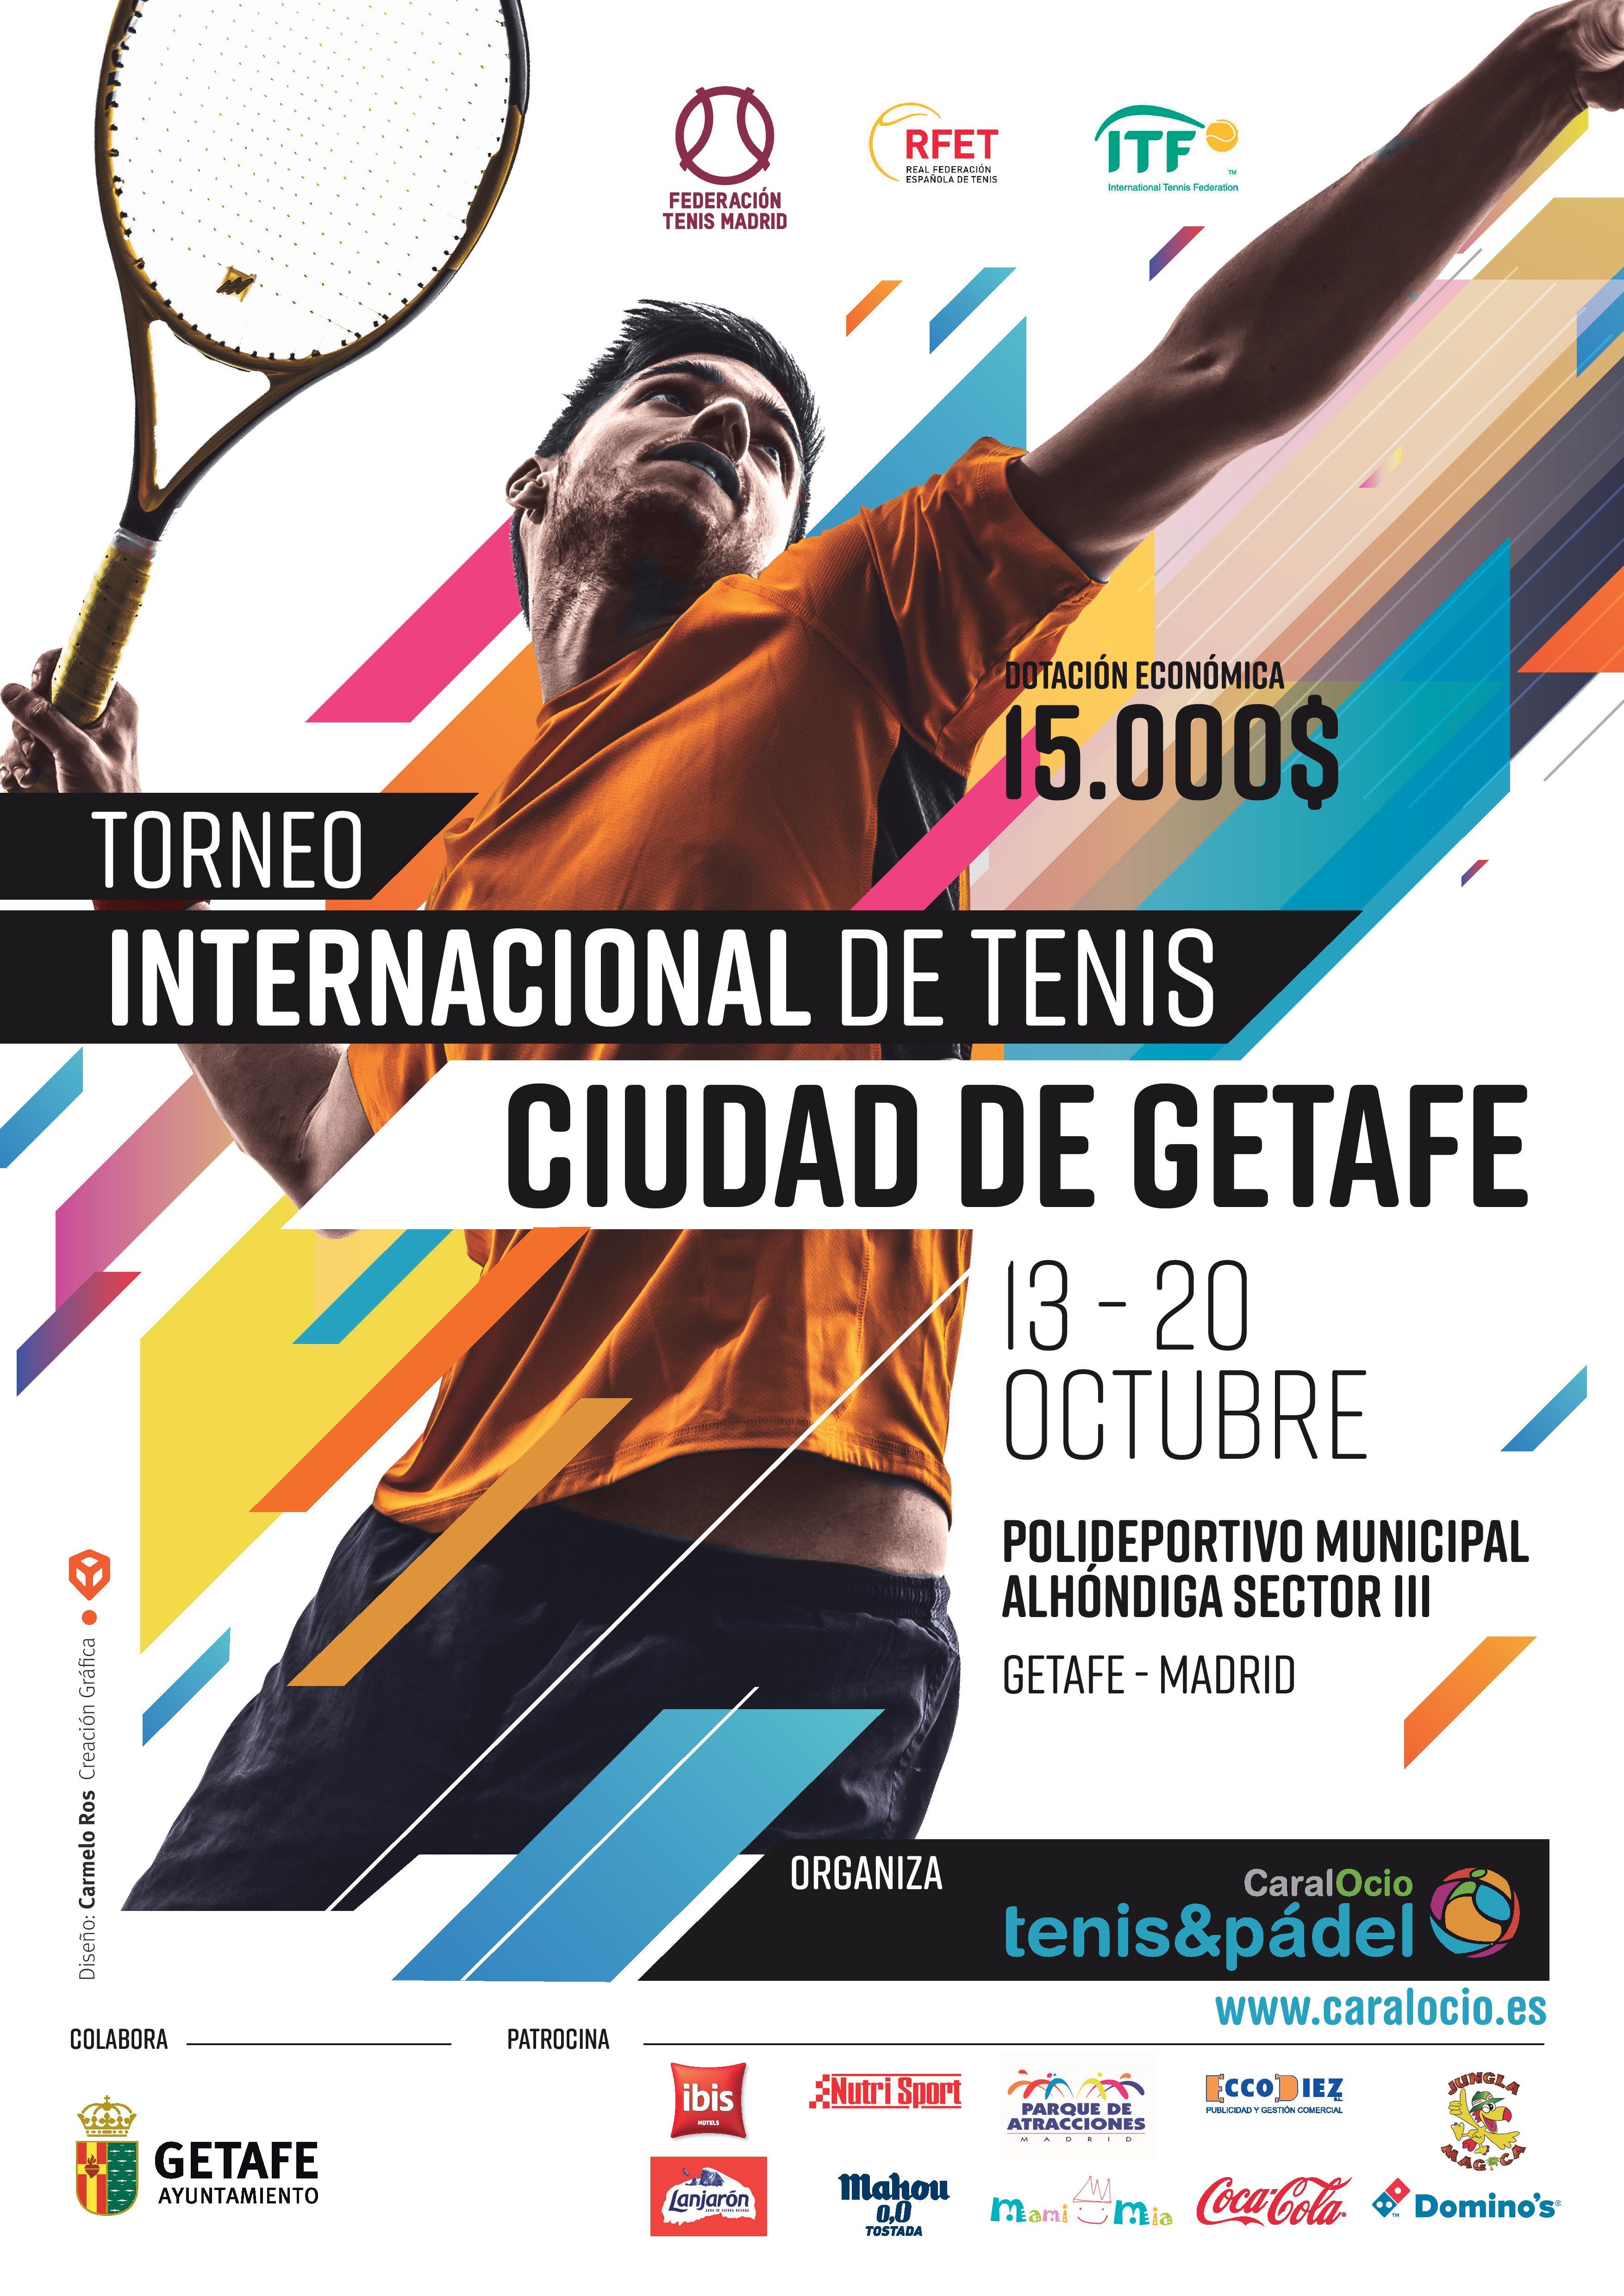 Torneo Internacional de Tenis